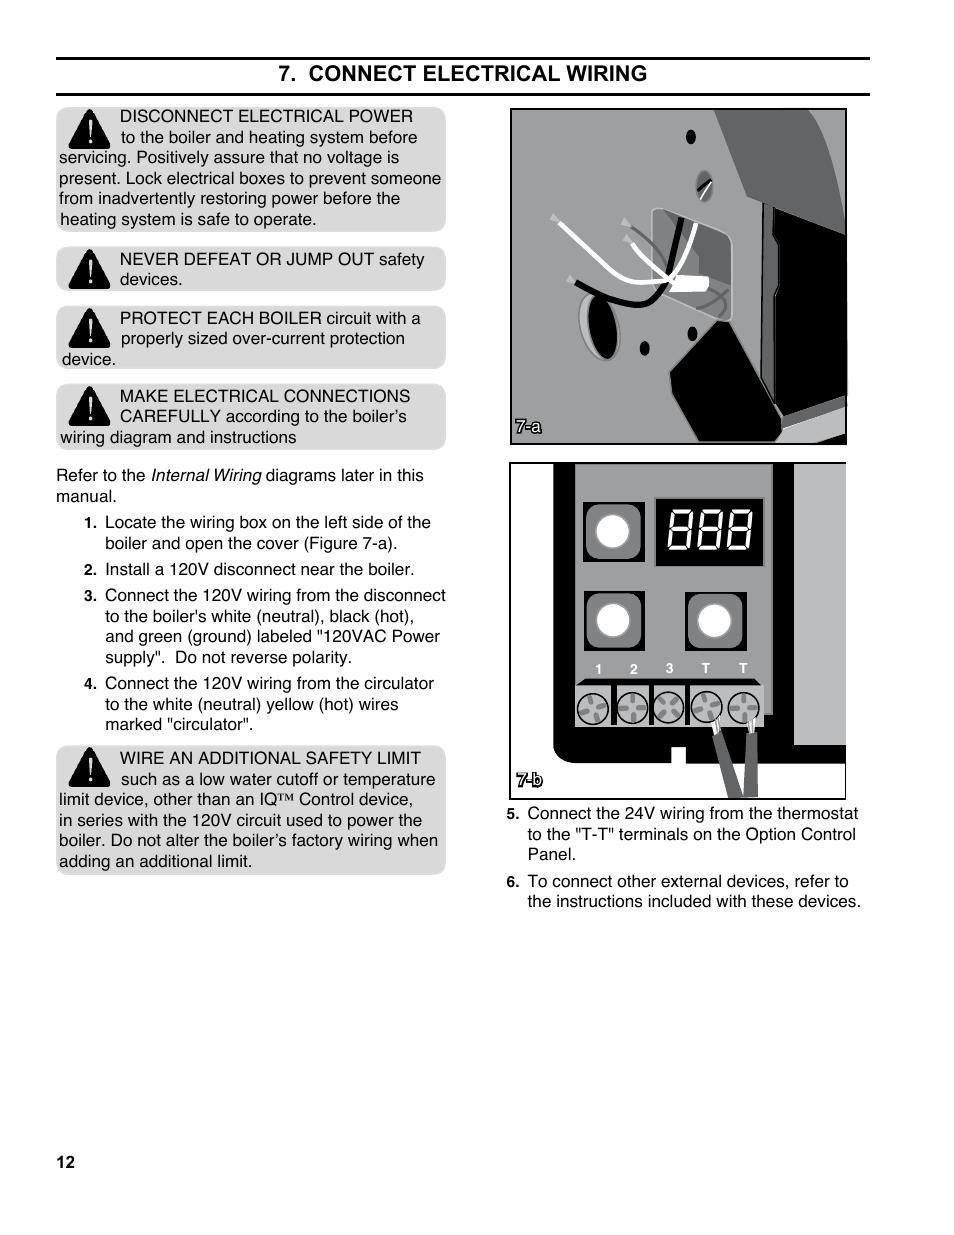 Connect Electrical Wiring Burnham Es2 User Manual Page 12 52 Boiler Diagram